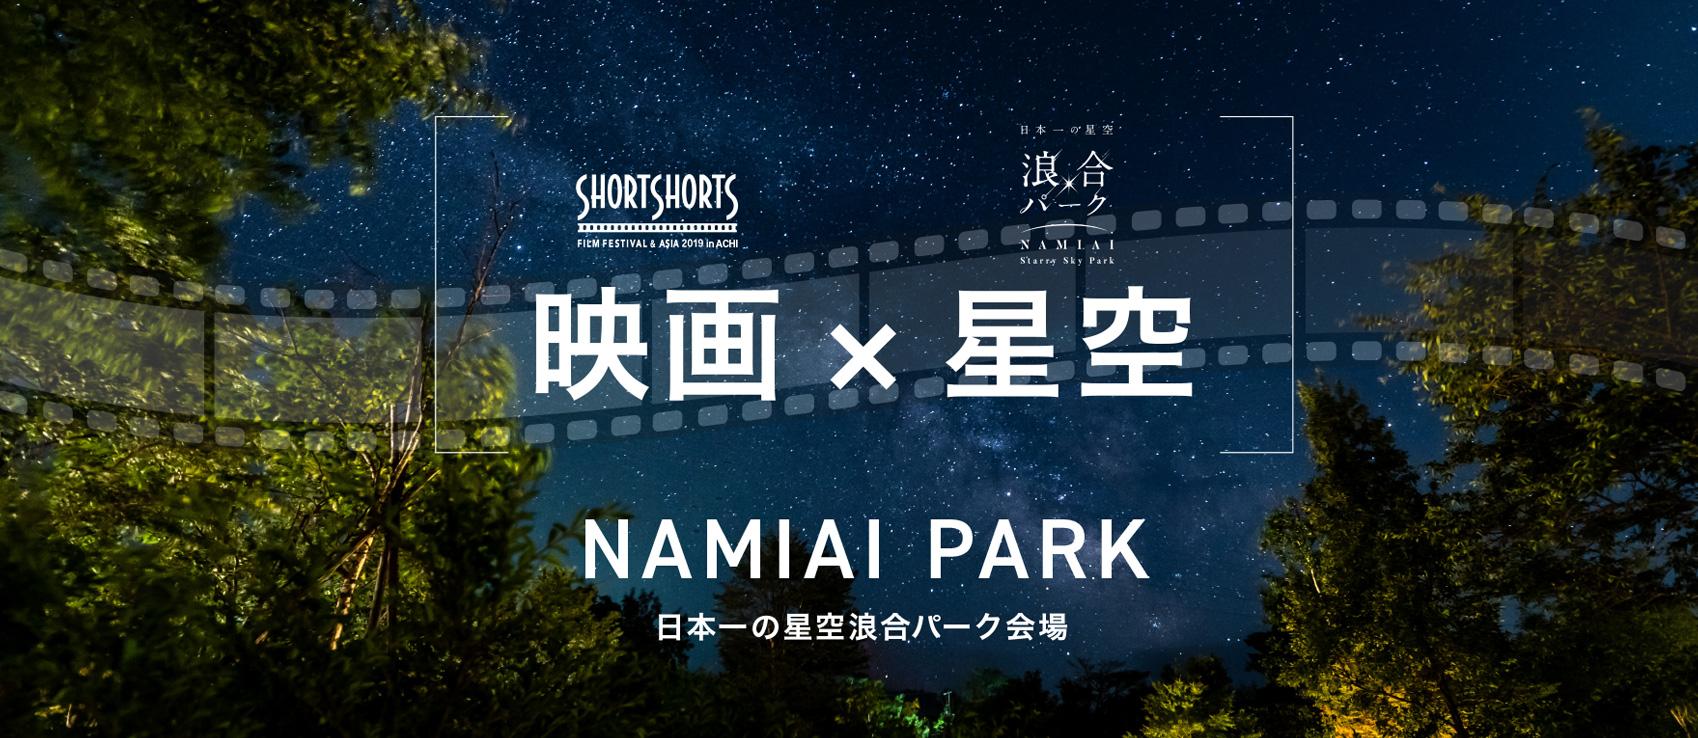 映画×星空NAMIAI PARK日本一の星空浪合パーク会場